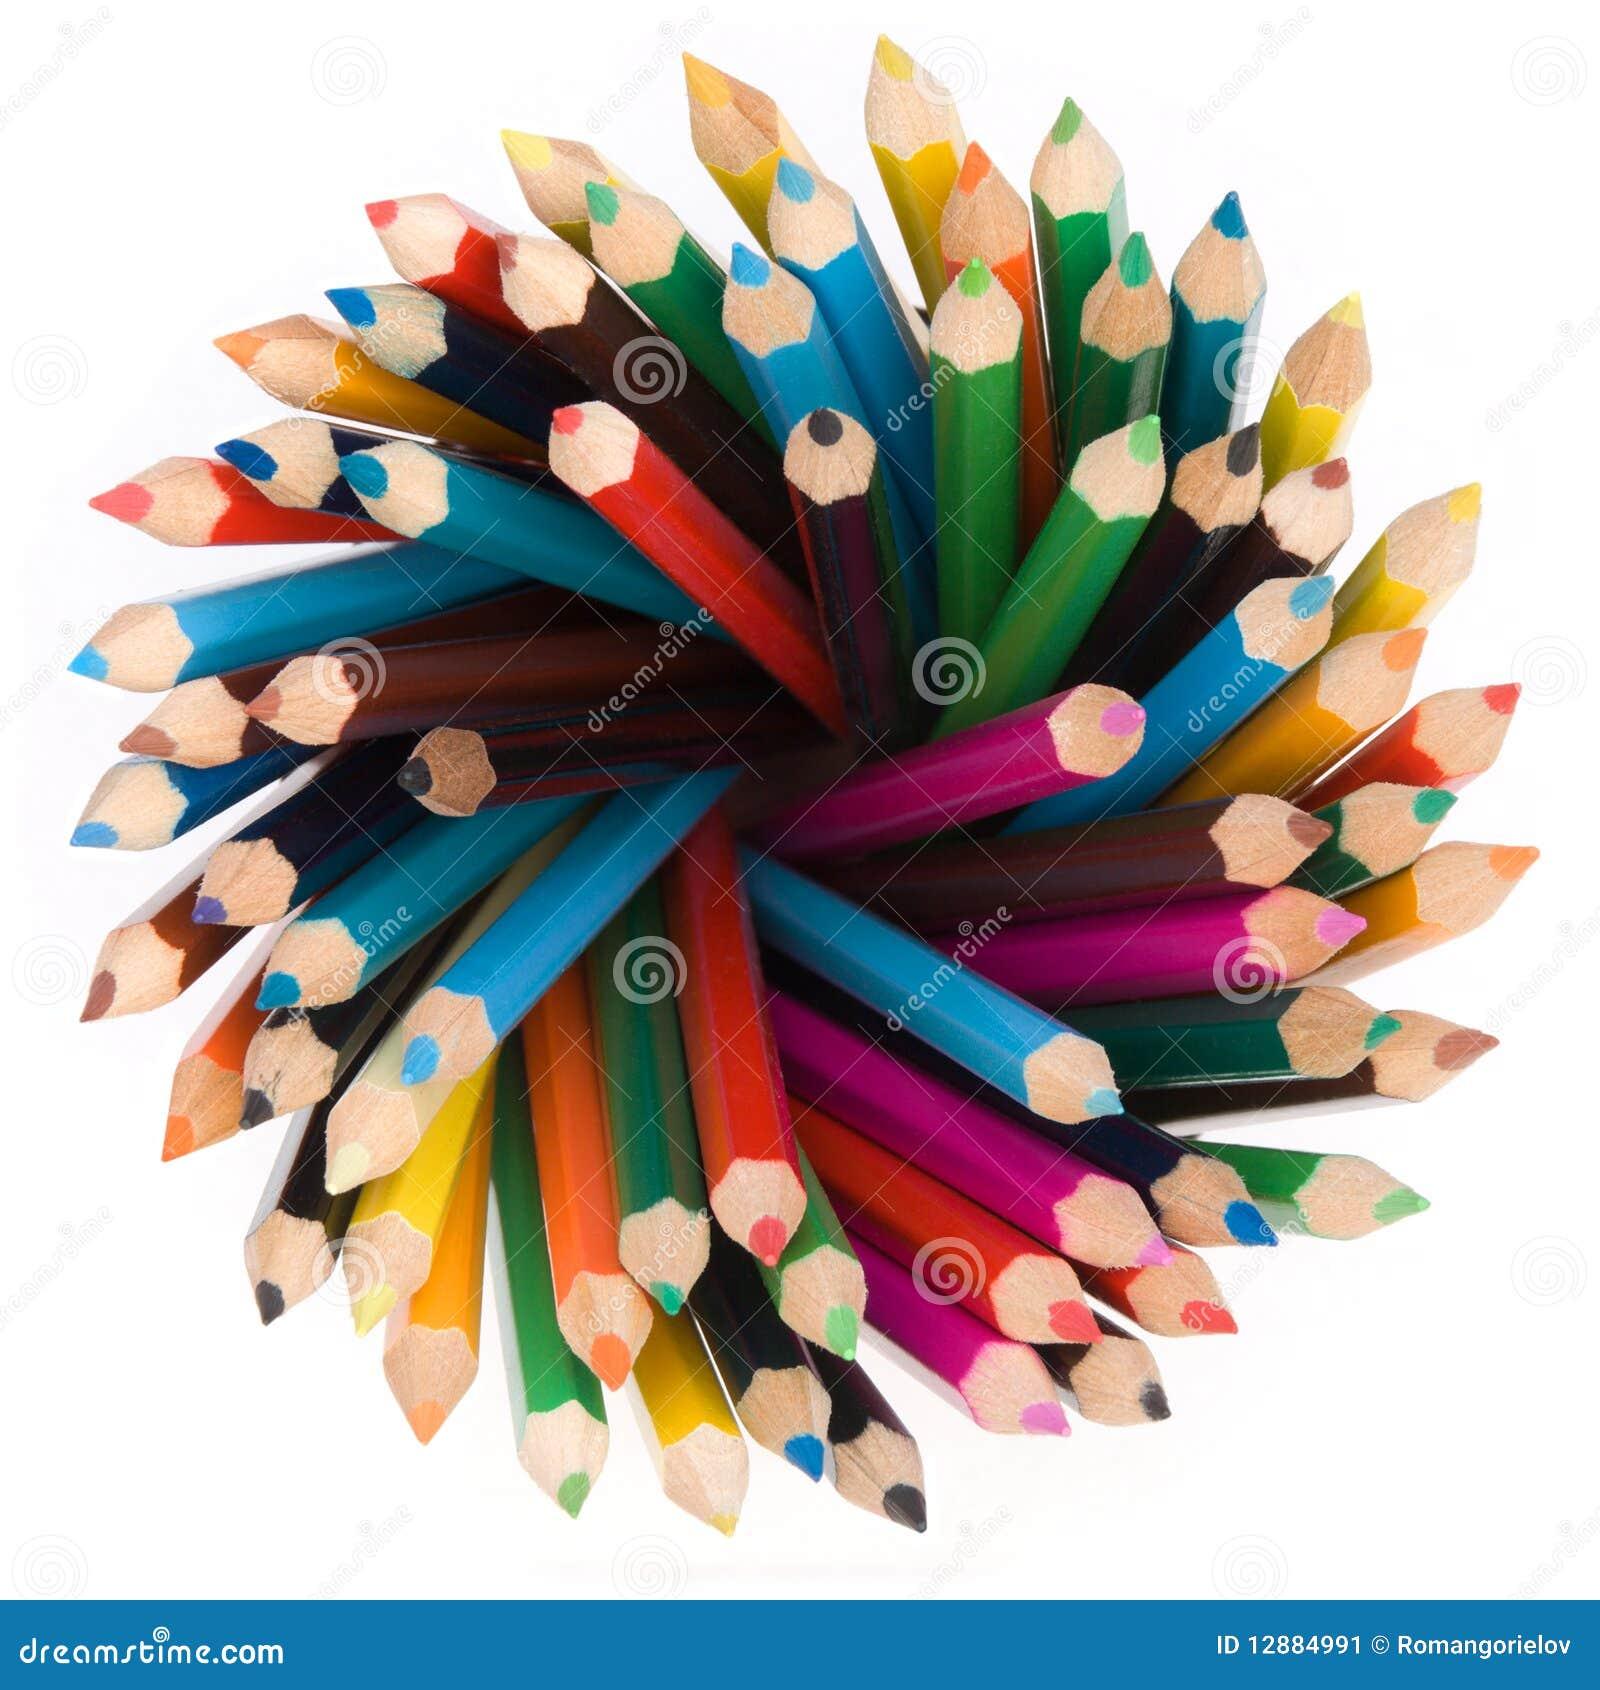 Pencils top view